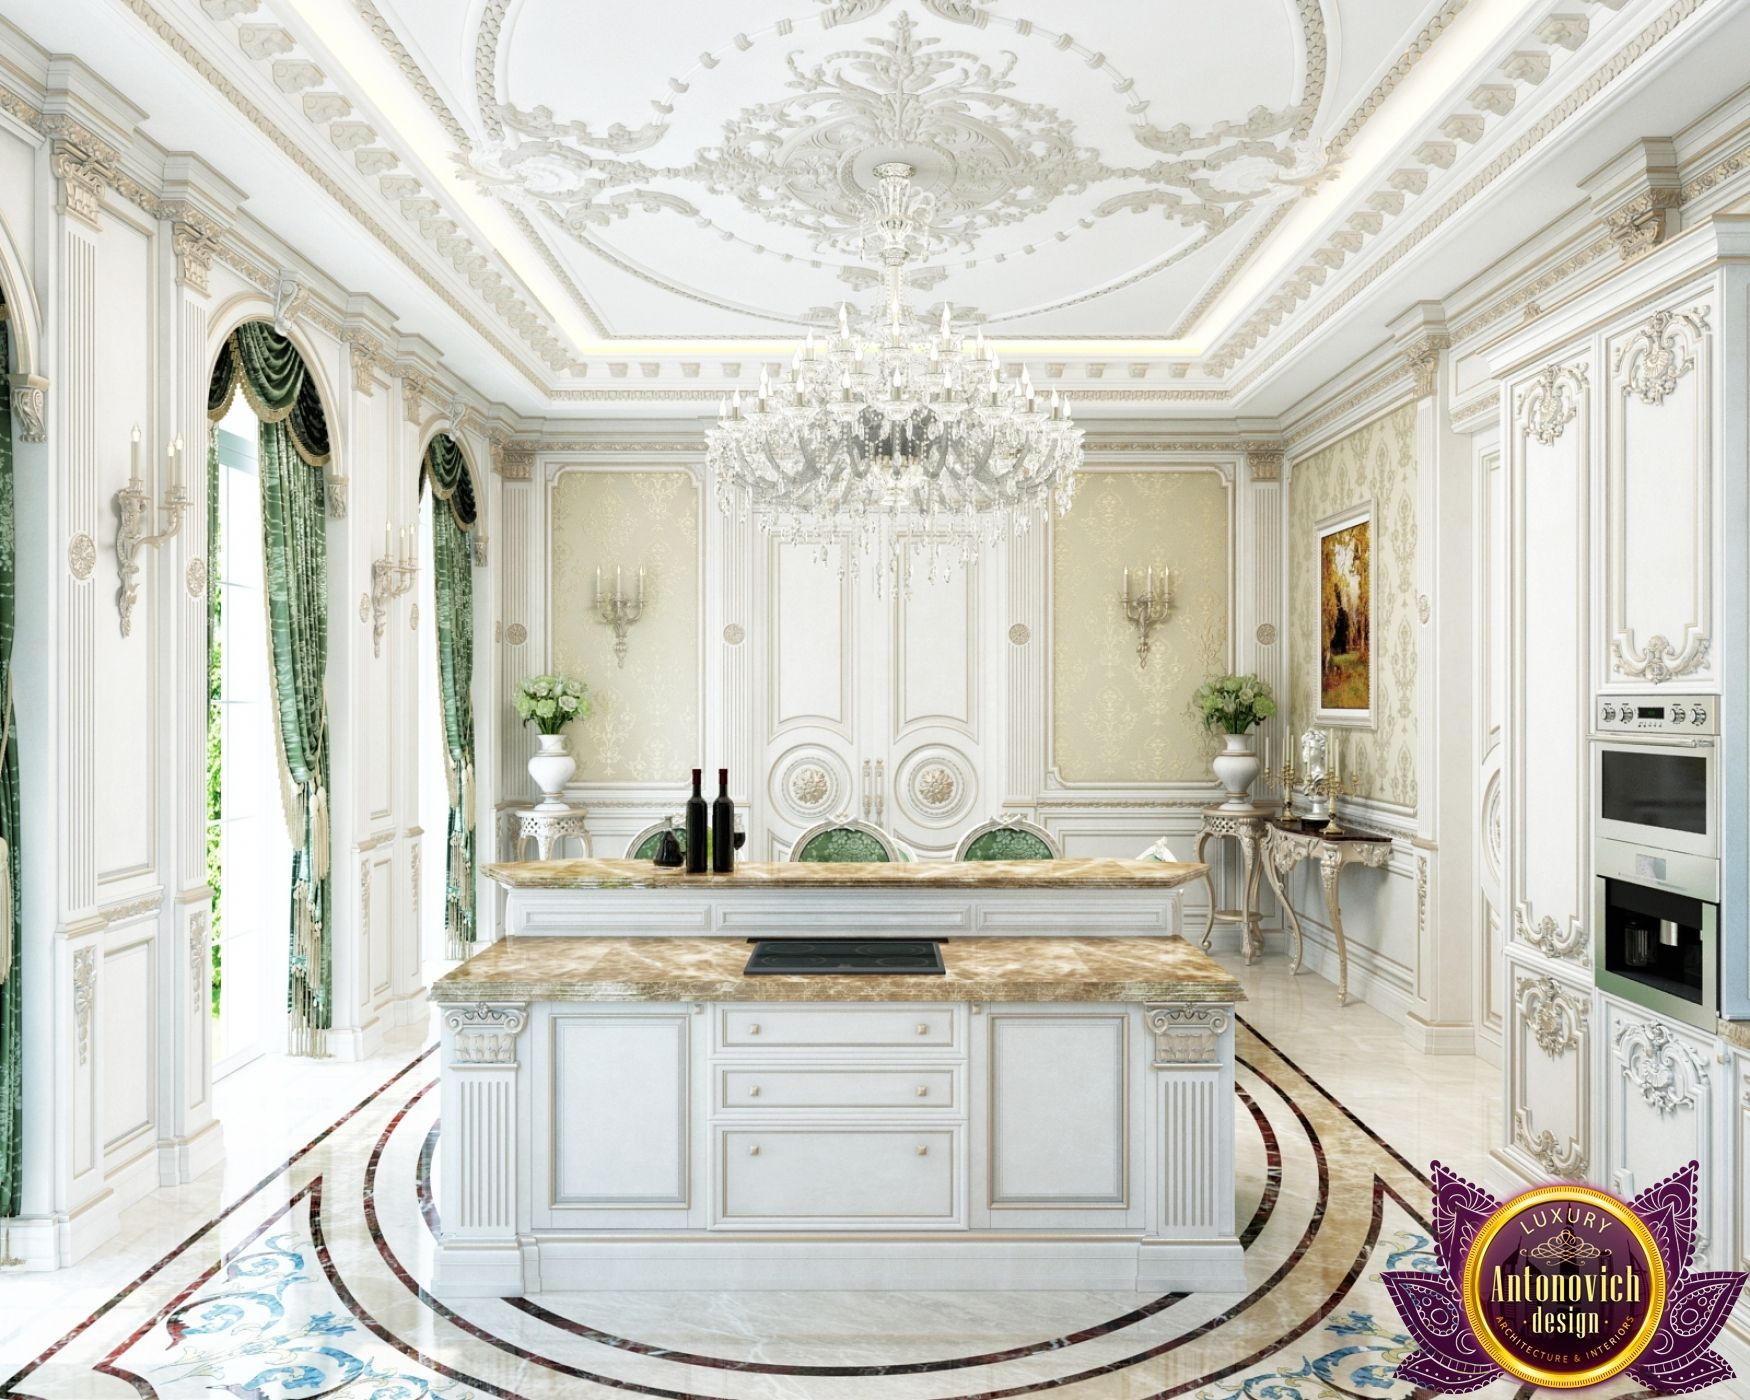 Royal Kitchen Design Elegant Kitchen Design Luxury Kitchen Design Luxury Kitchens